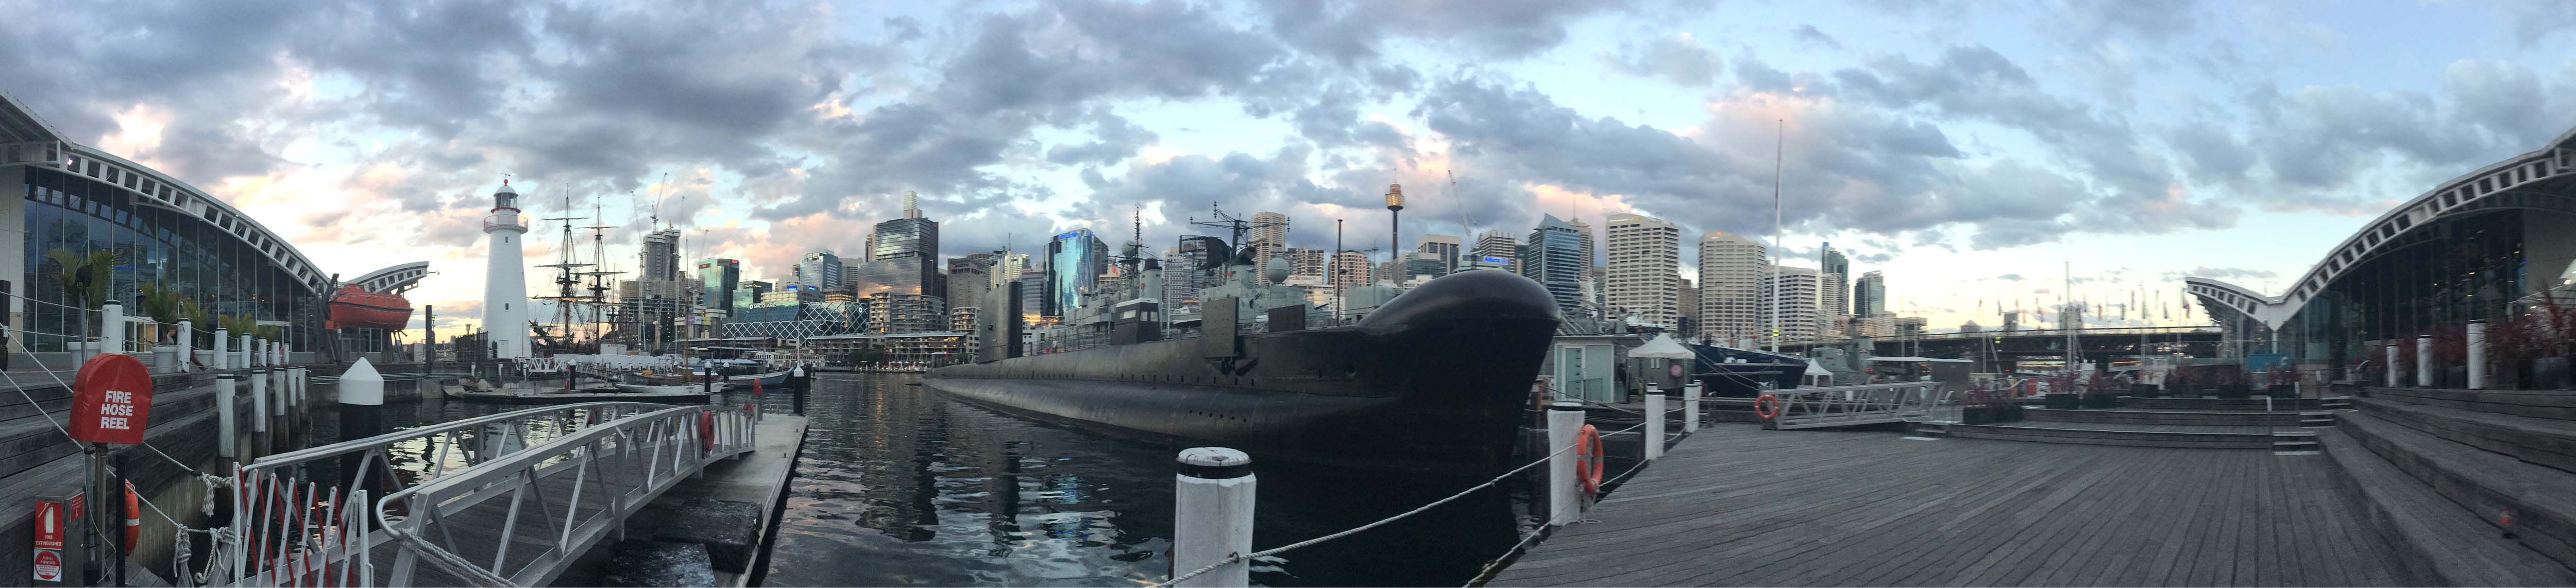 05 Australian National Maritime Museum Darling Harbour, Sydney